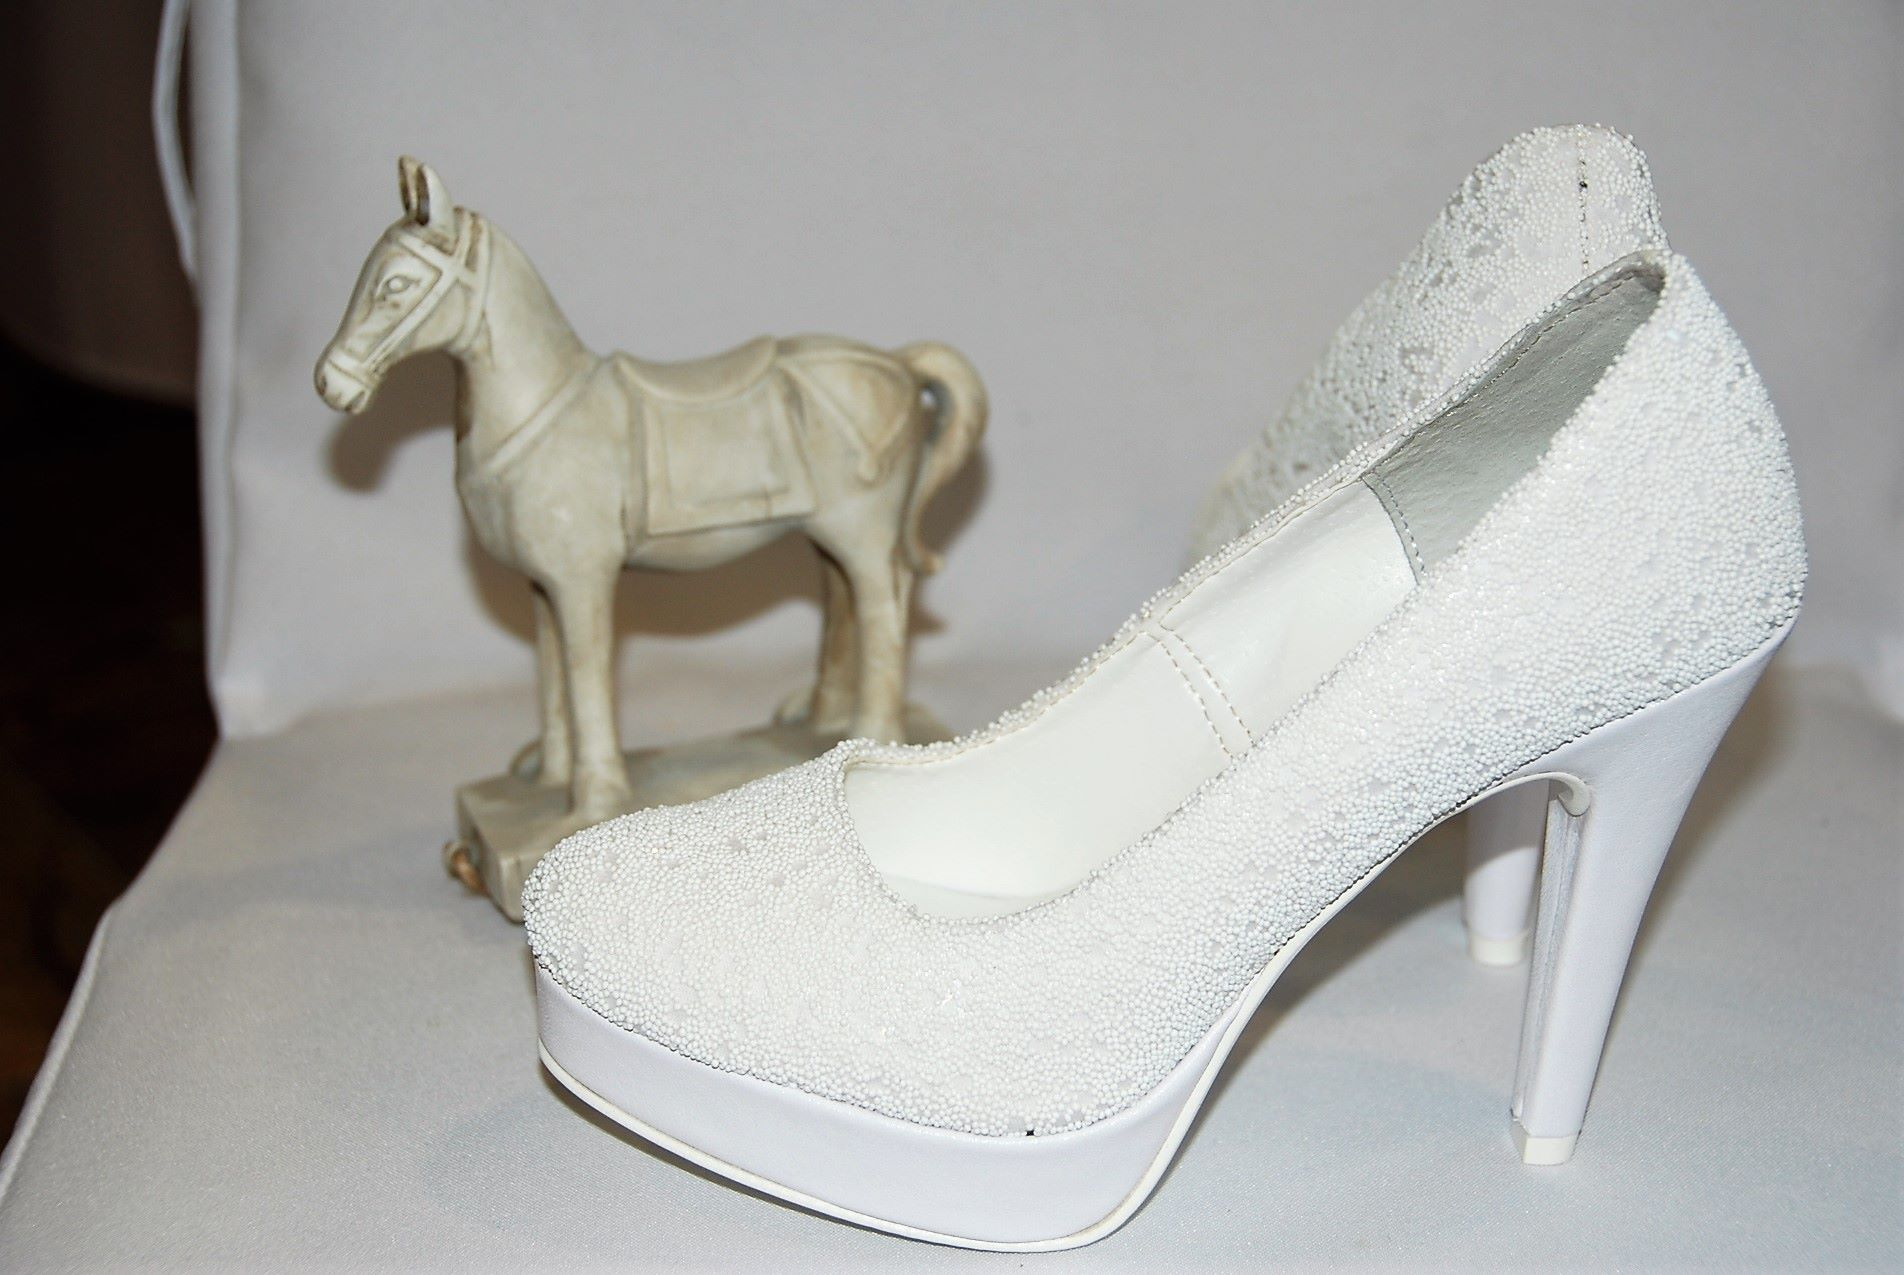 8e945c1b1b44 Svadobné topánky